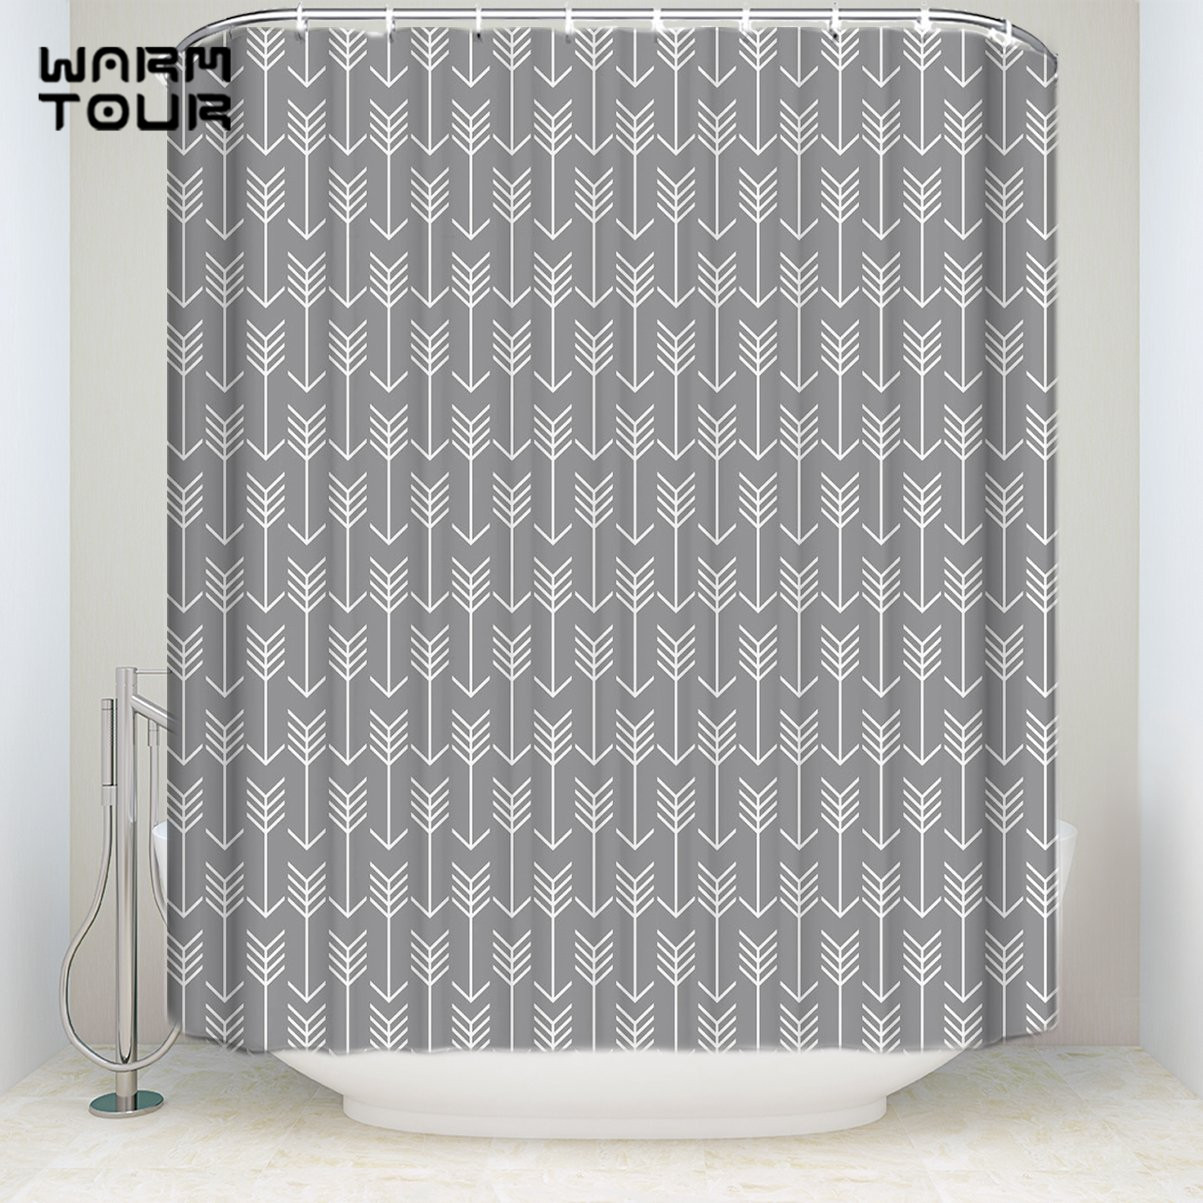 Extra Long Fabric Bath Shower Curtains Geometric Grey Arrows Mildew-resistant Bathroom Decor Sets with Hooks 36 x 78